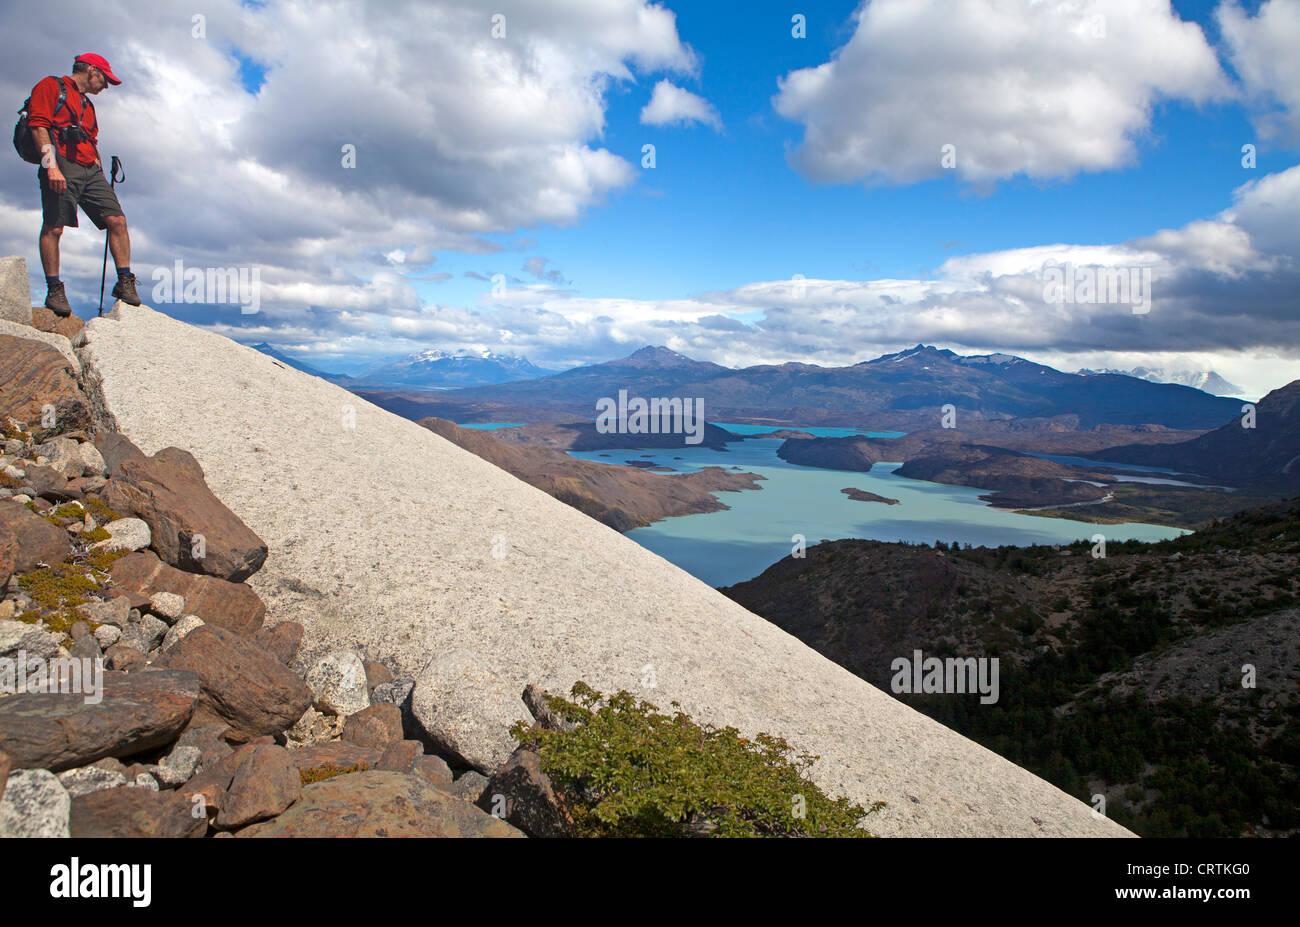 Hiker above Lago Nordenskjold in Torres del Paine National Park Stock Photo